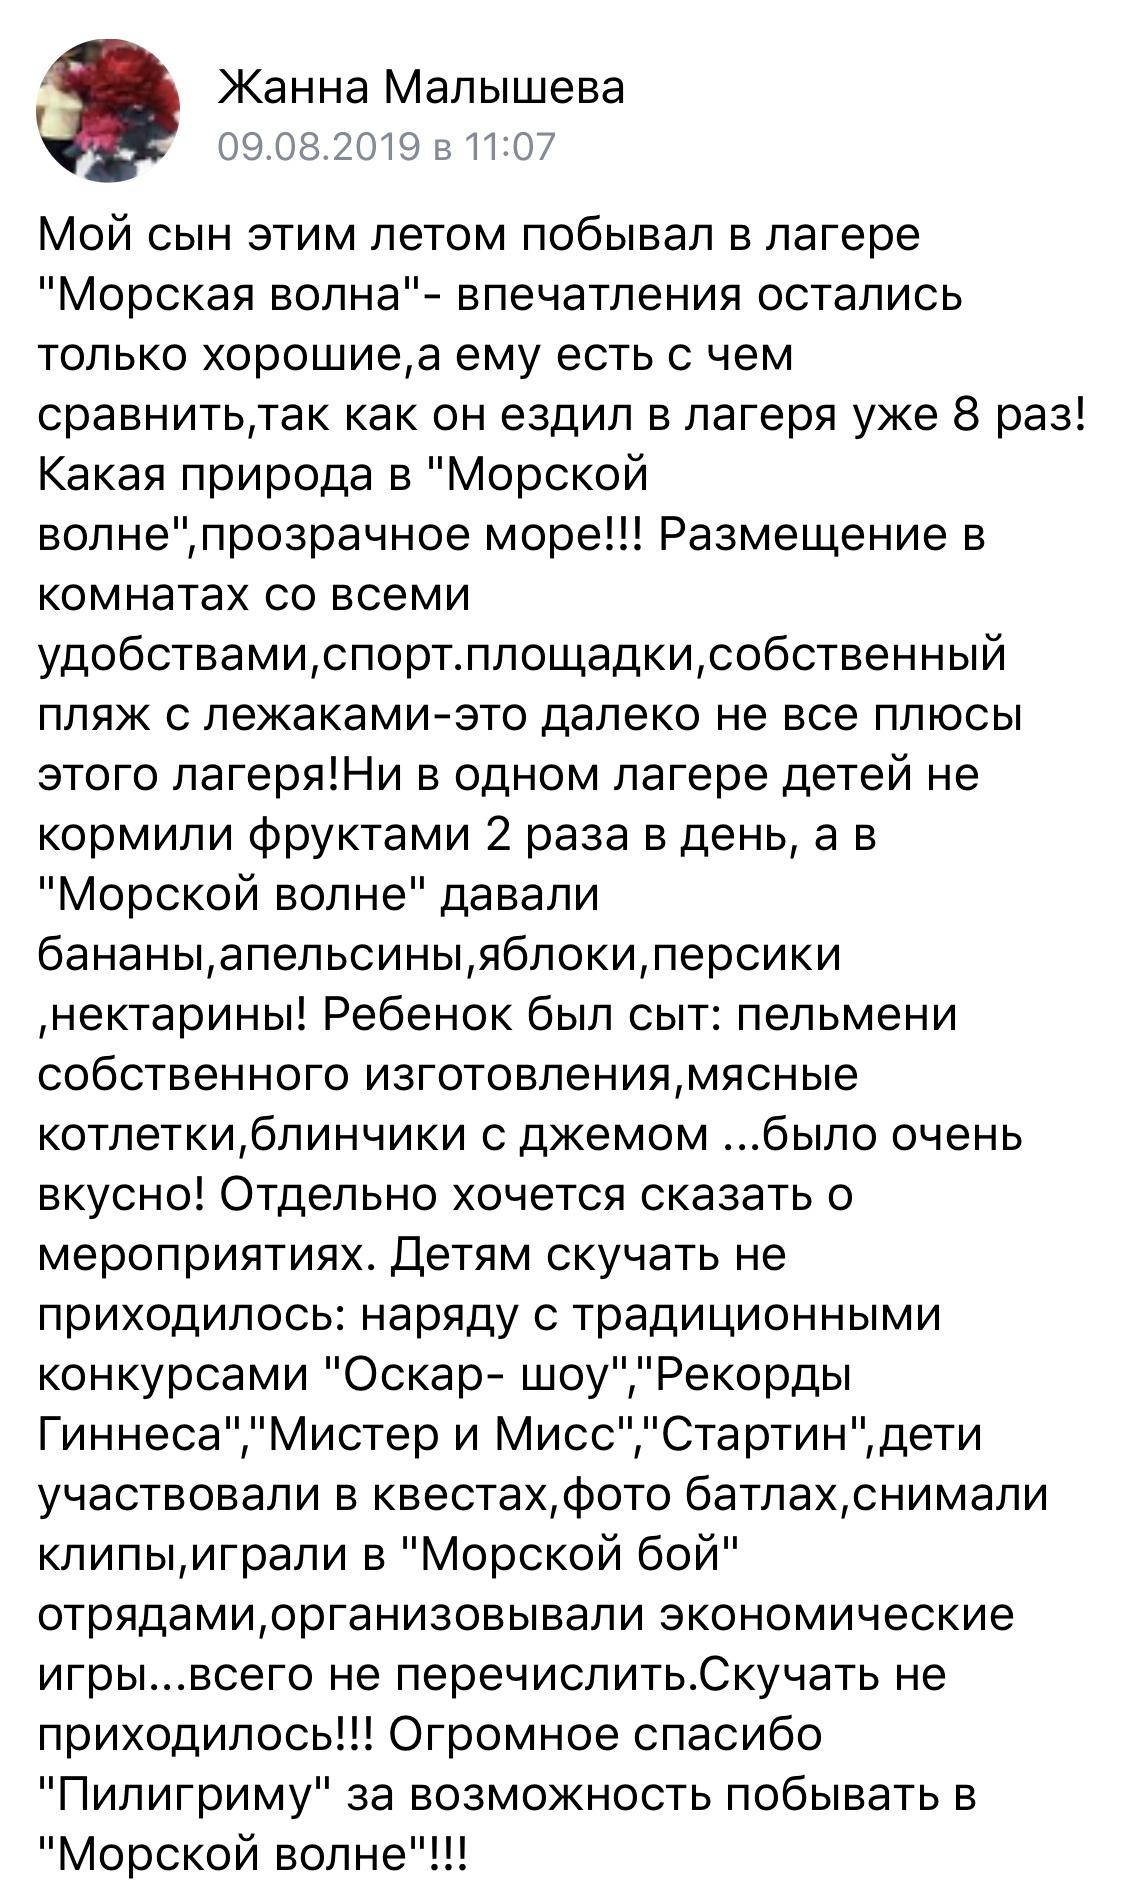 Отзыв  Жанна Малышева  о Пилигрим Плюс